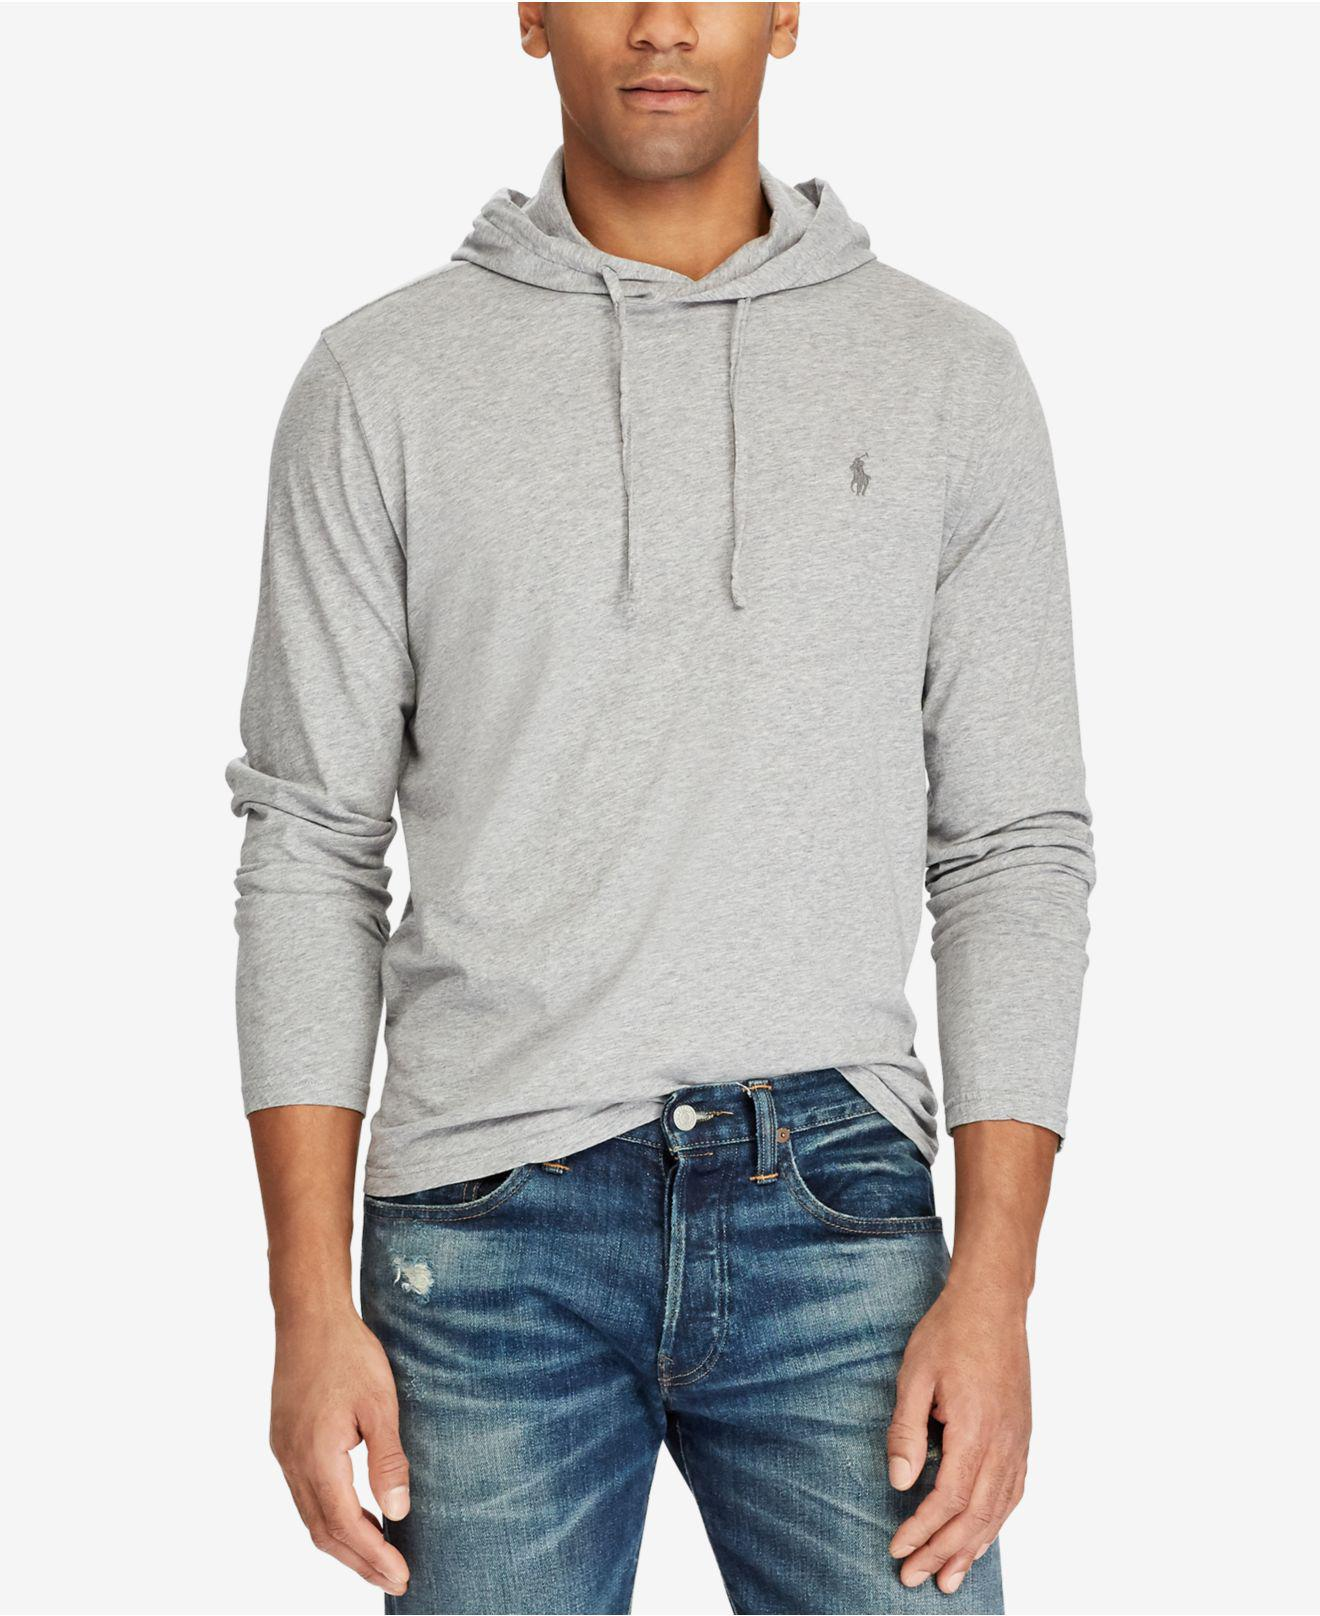 e5afbd4508a5 Lyst - Polo Ralph Lauren Men s Jersey T-shirt Hoodie in Gray for Men - Save  29%